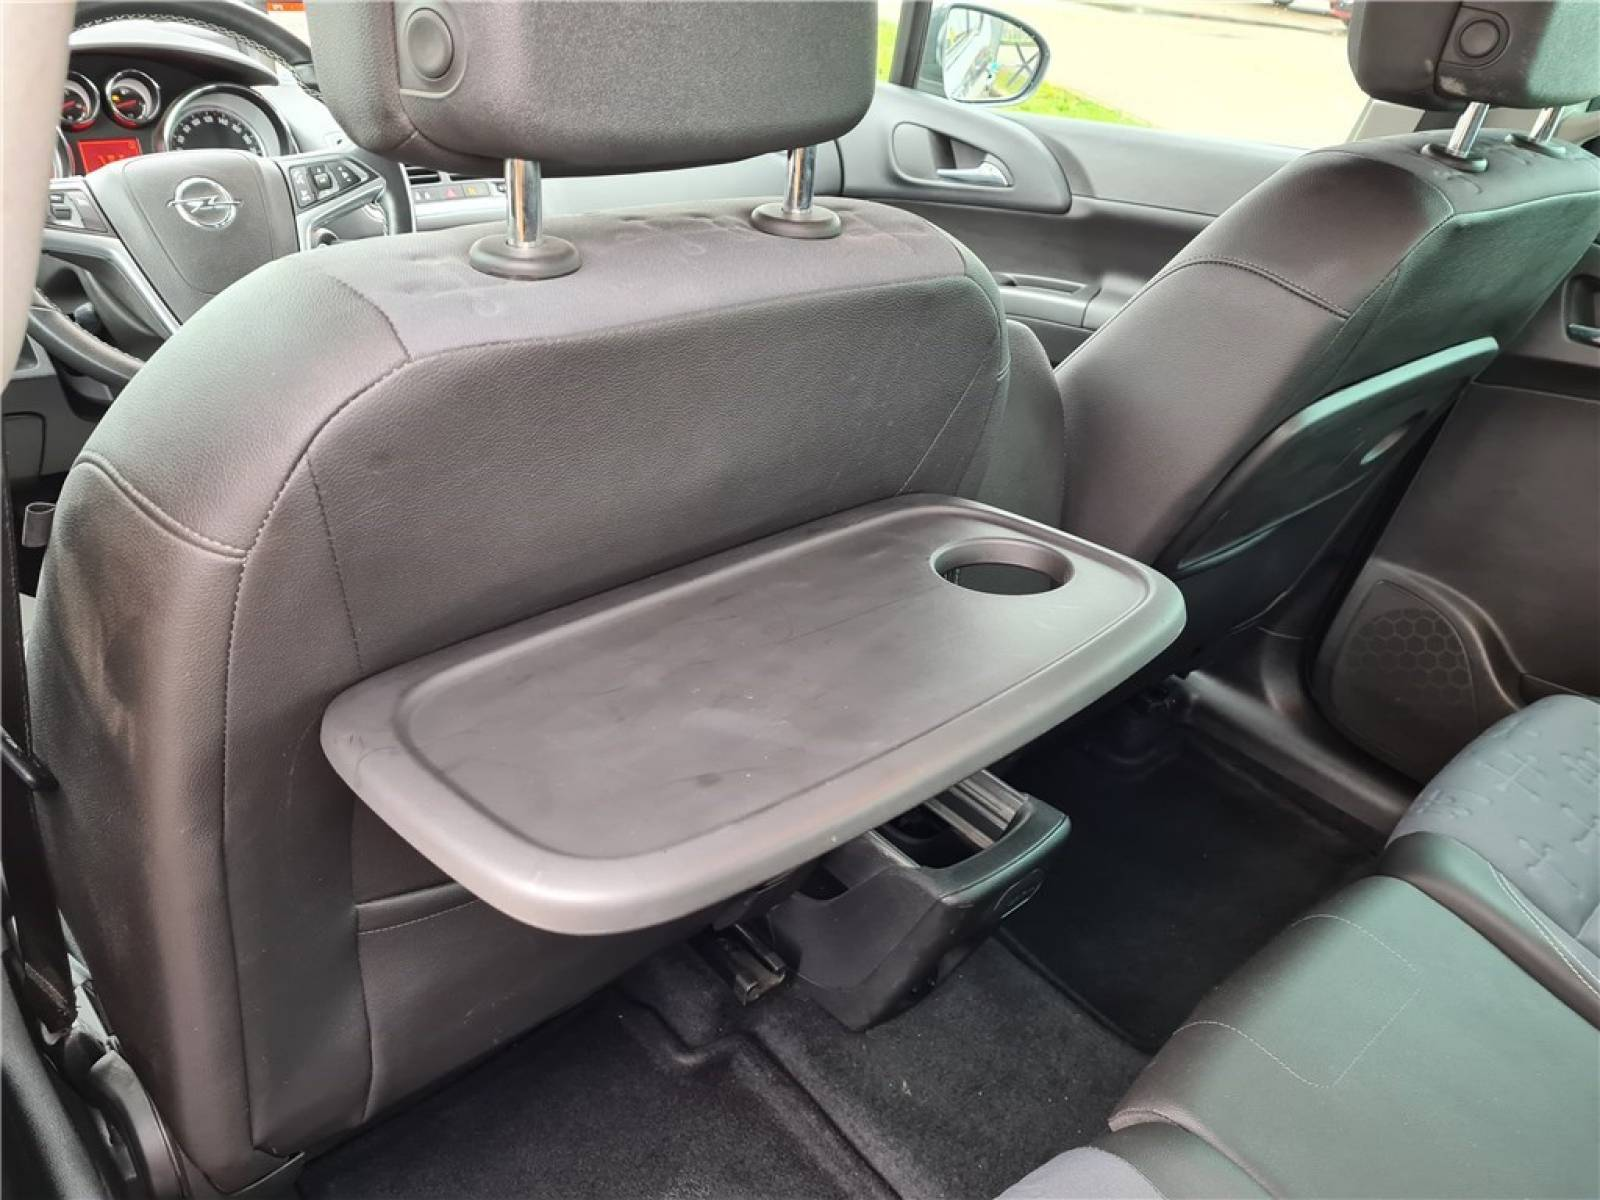 OPEL Meriva 1.6 CDTI - 110 ch Start/Stop - véhicule d'occasion - Groupe Guillet - Opel Magicauto - Chalon-sur-Saône - 71380 - Saint-Marcel - 26